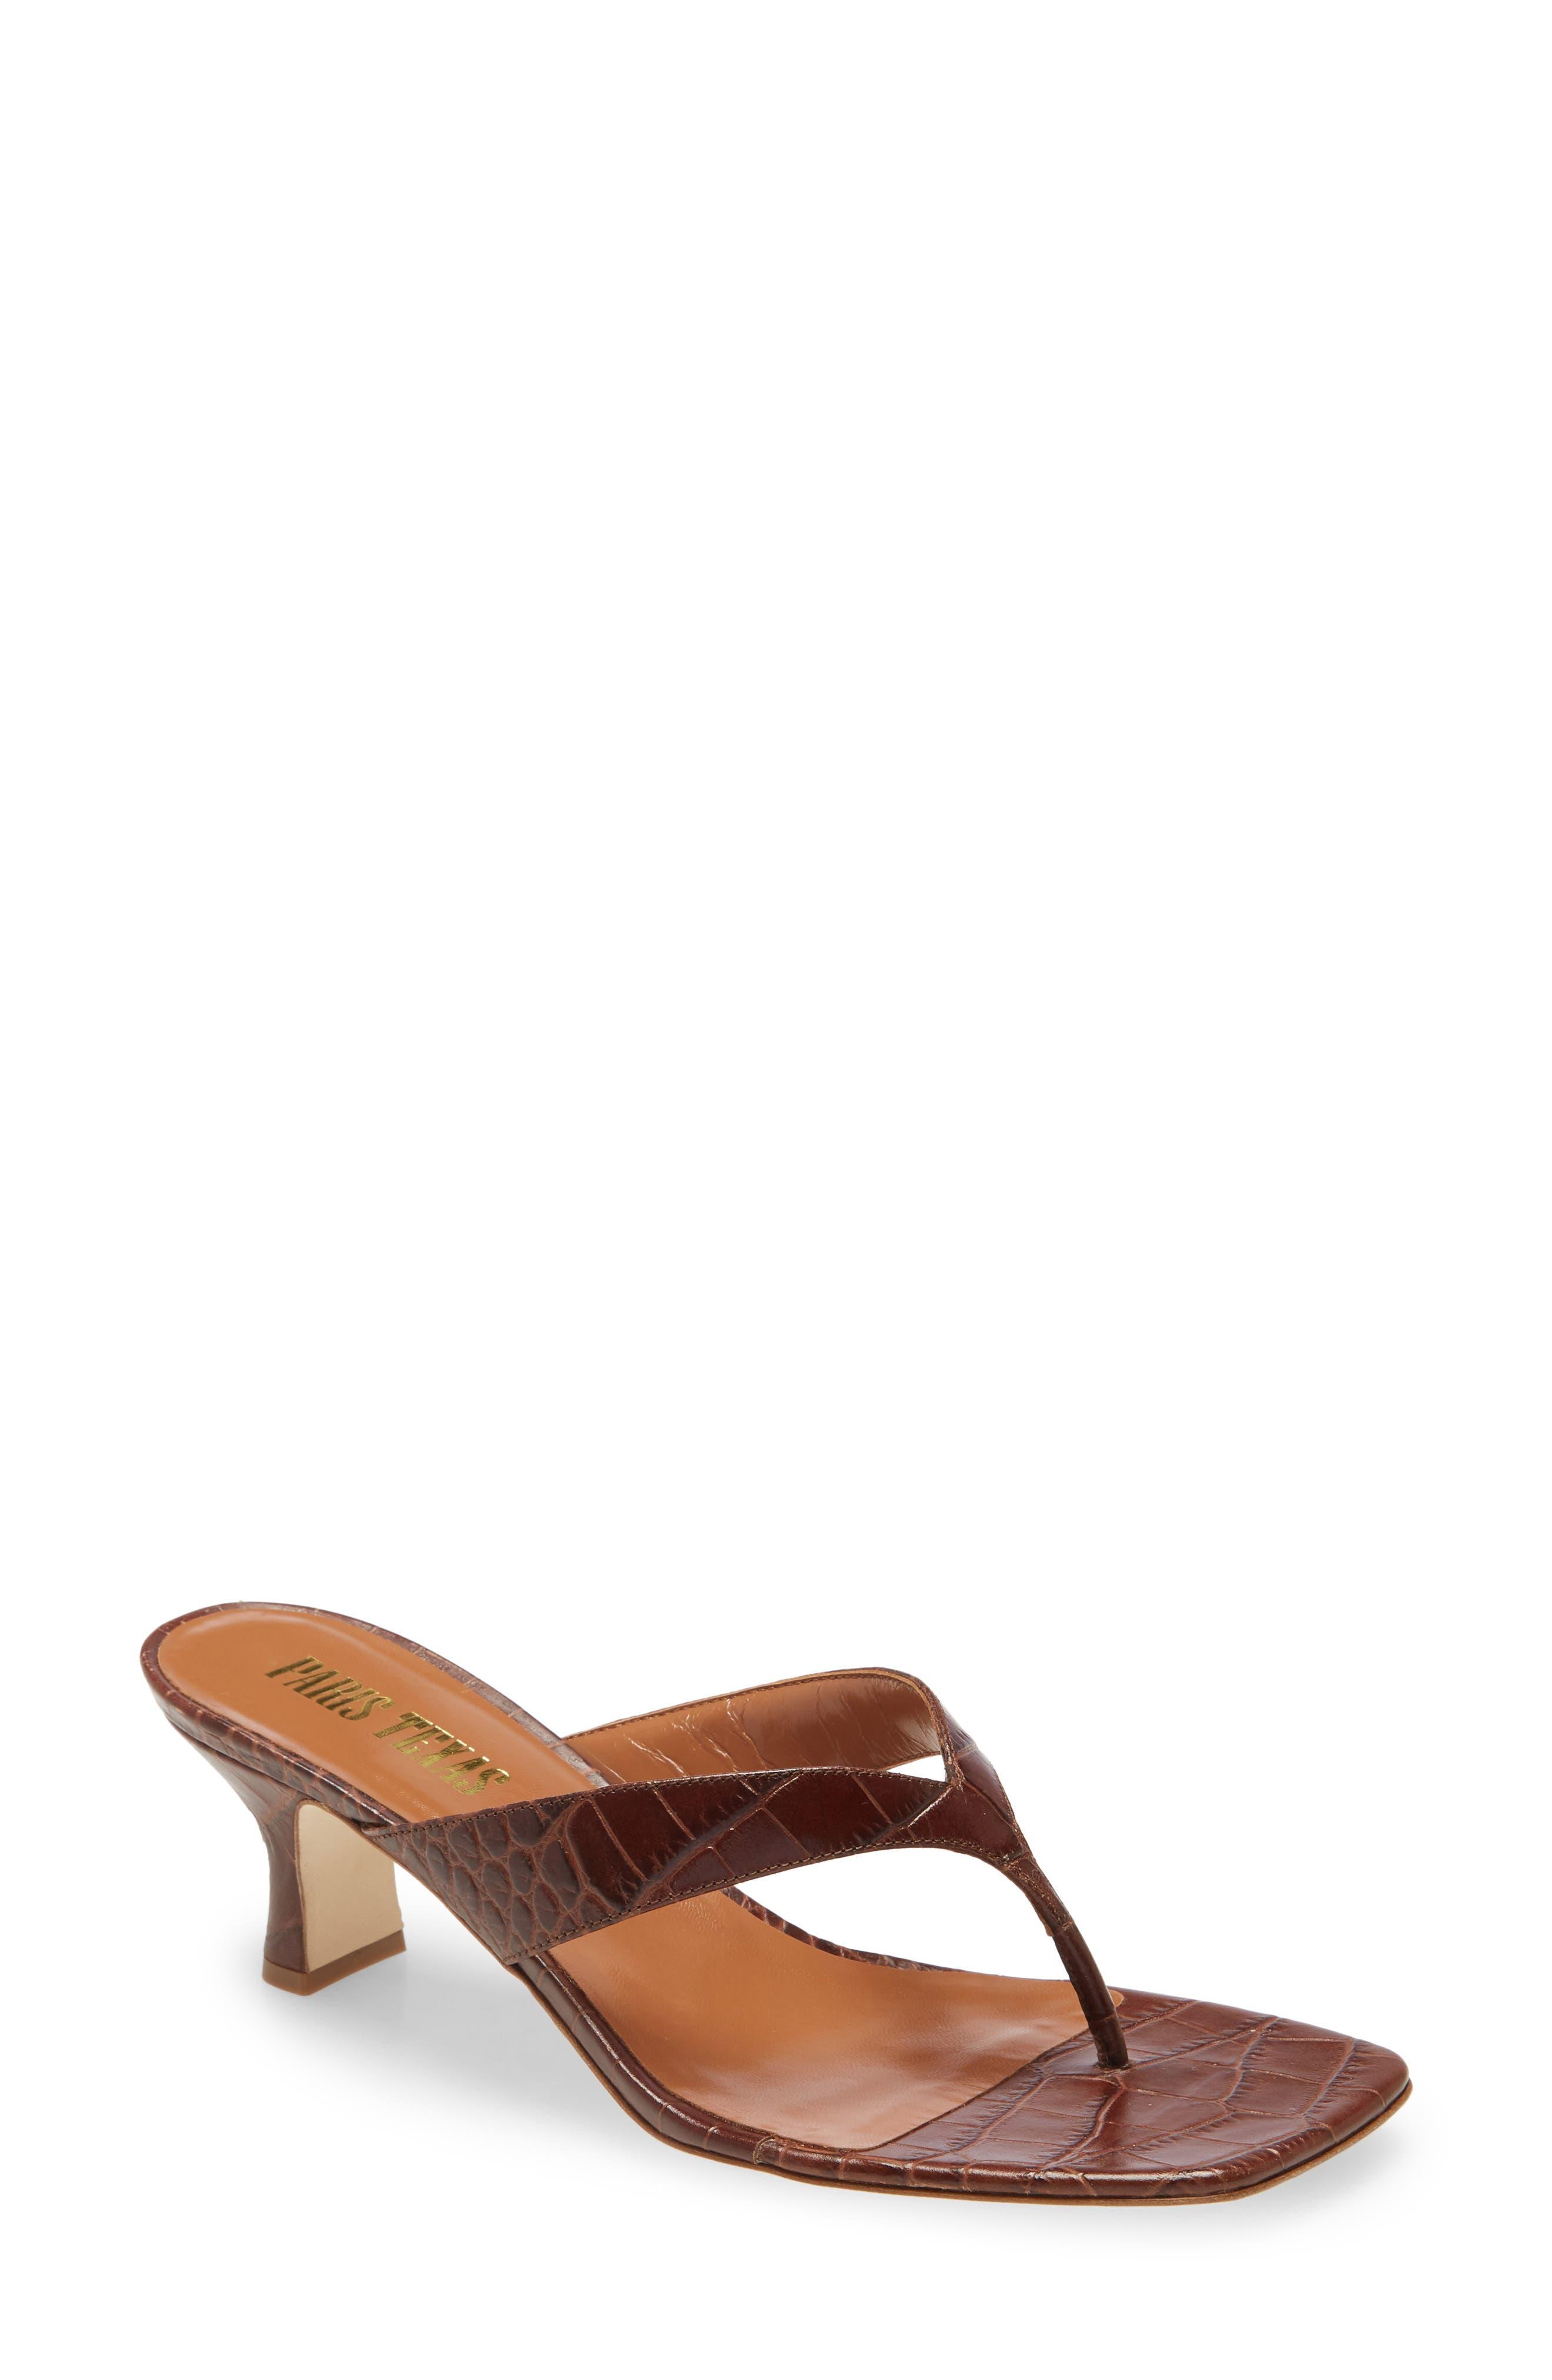 Image of PARIS TEXAS Croc Embossed Sandal